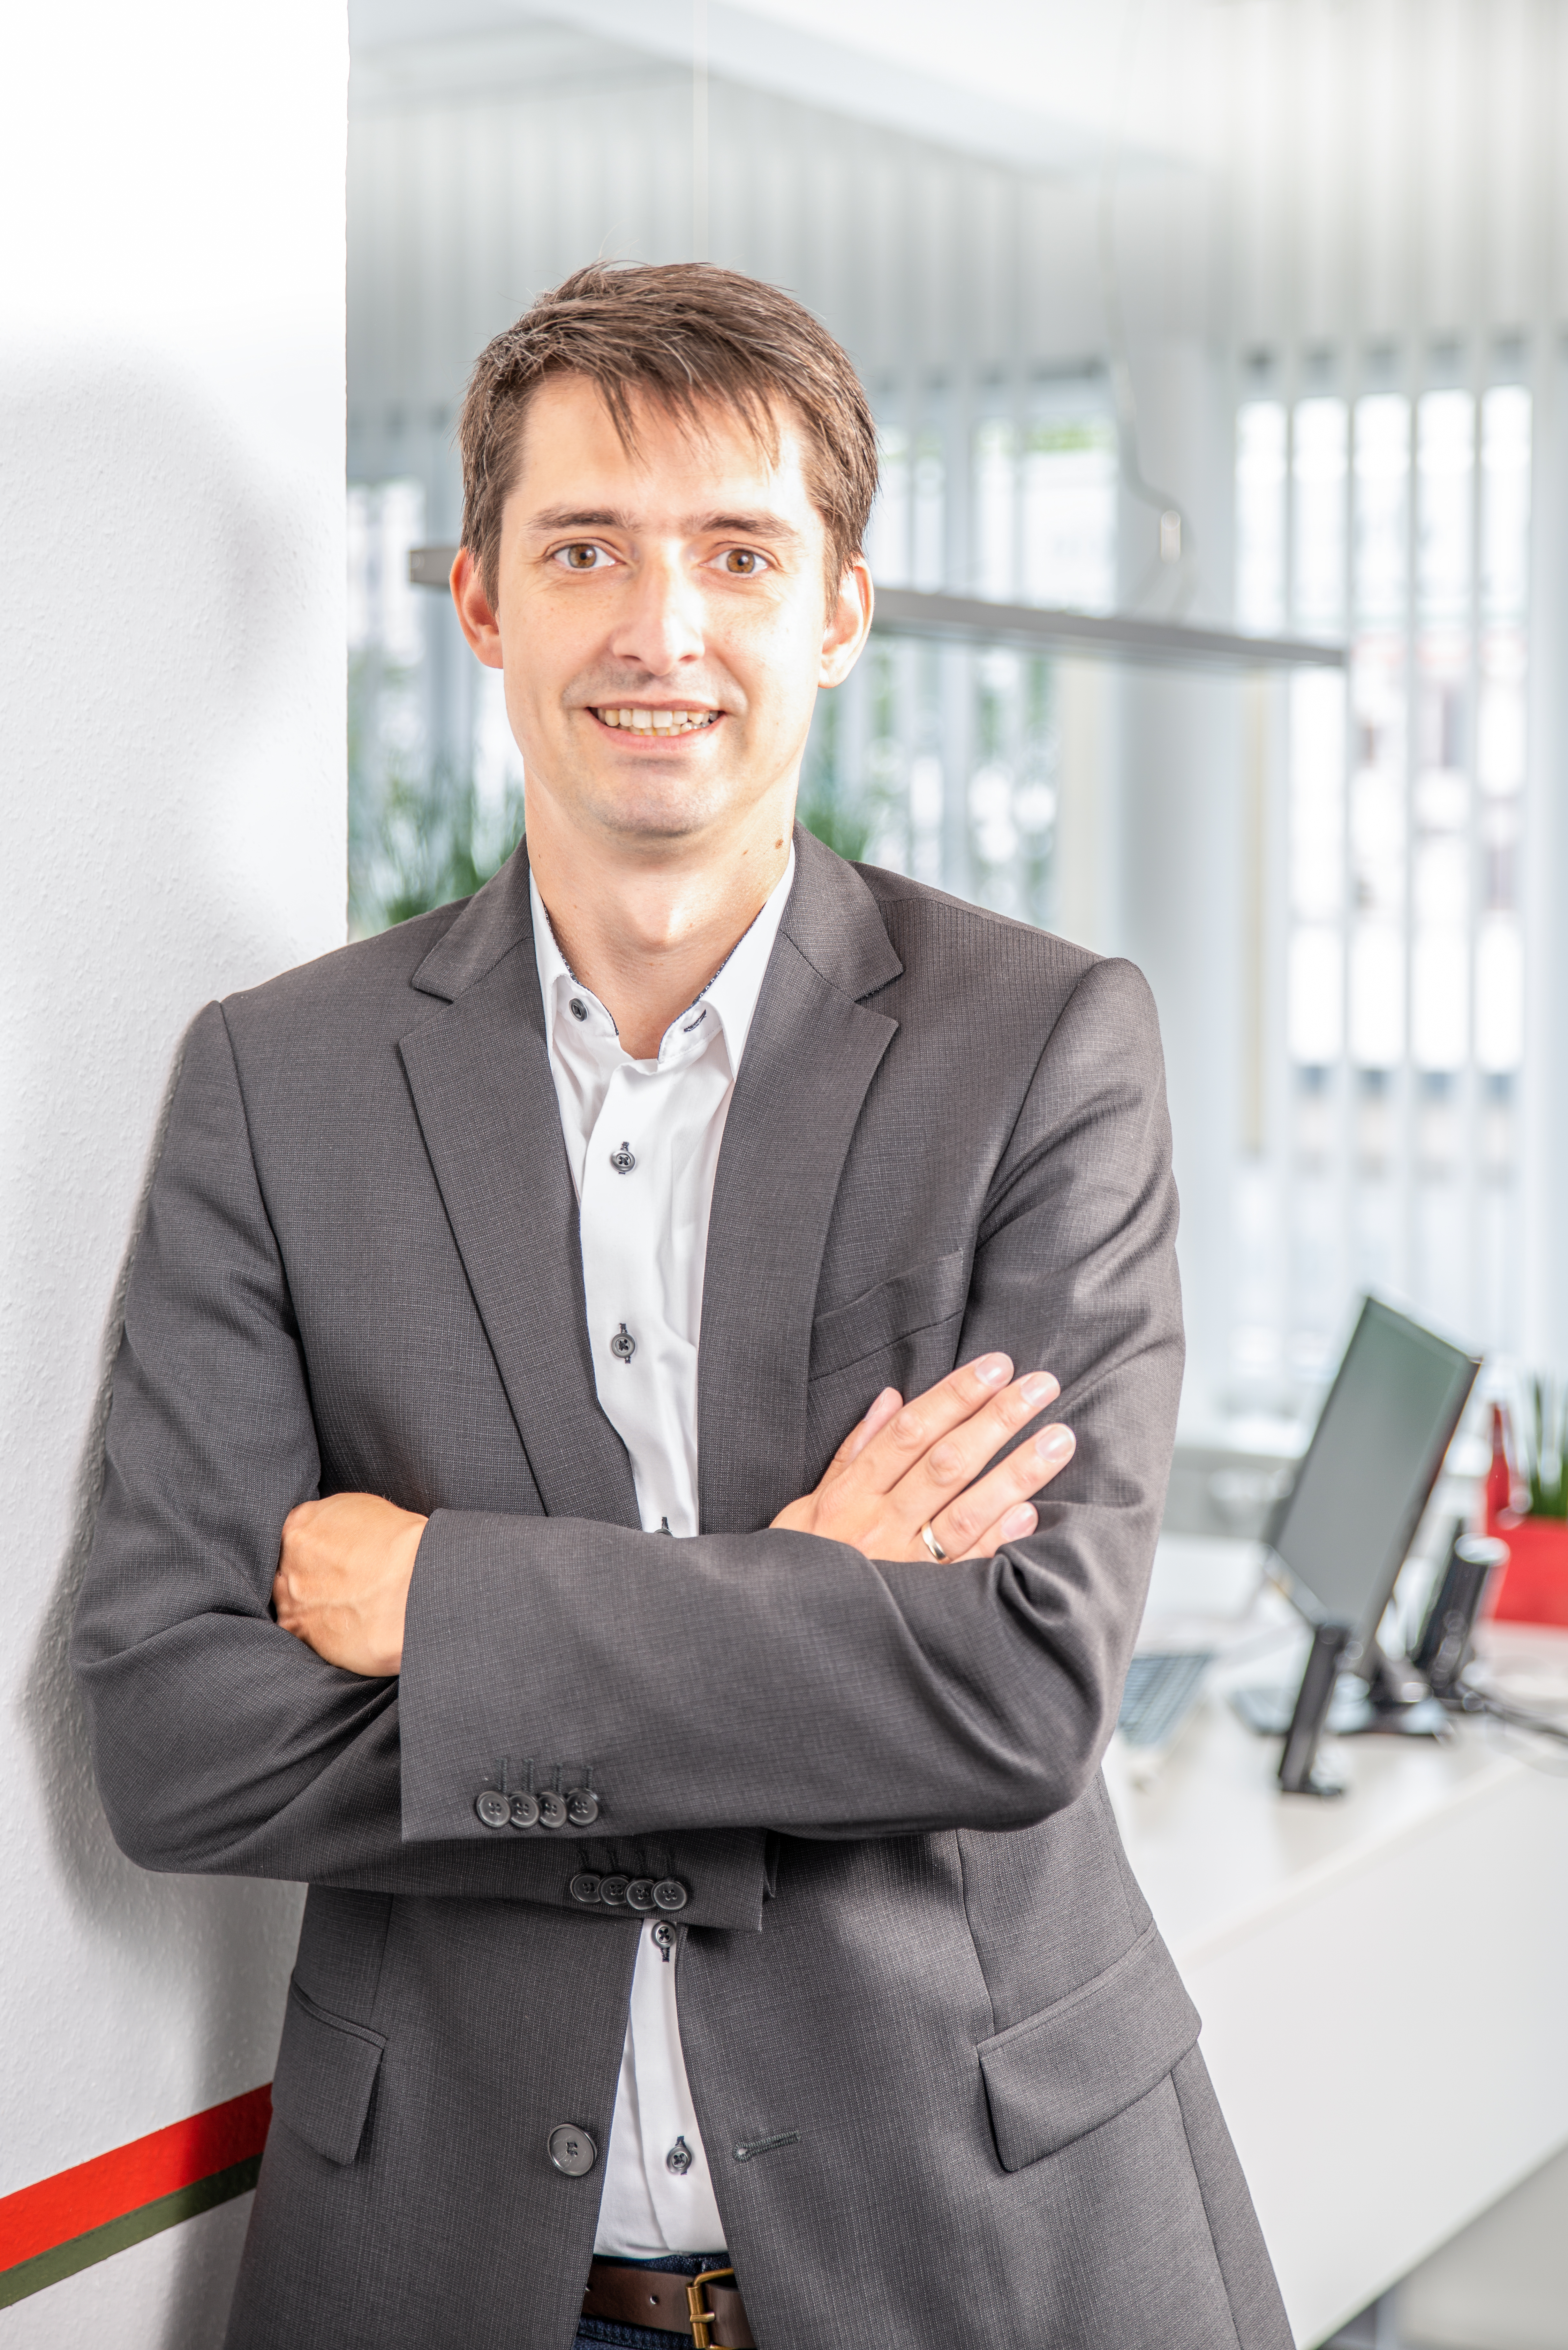 Jens Kujawiak